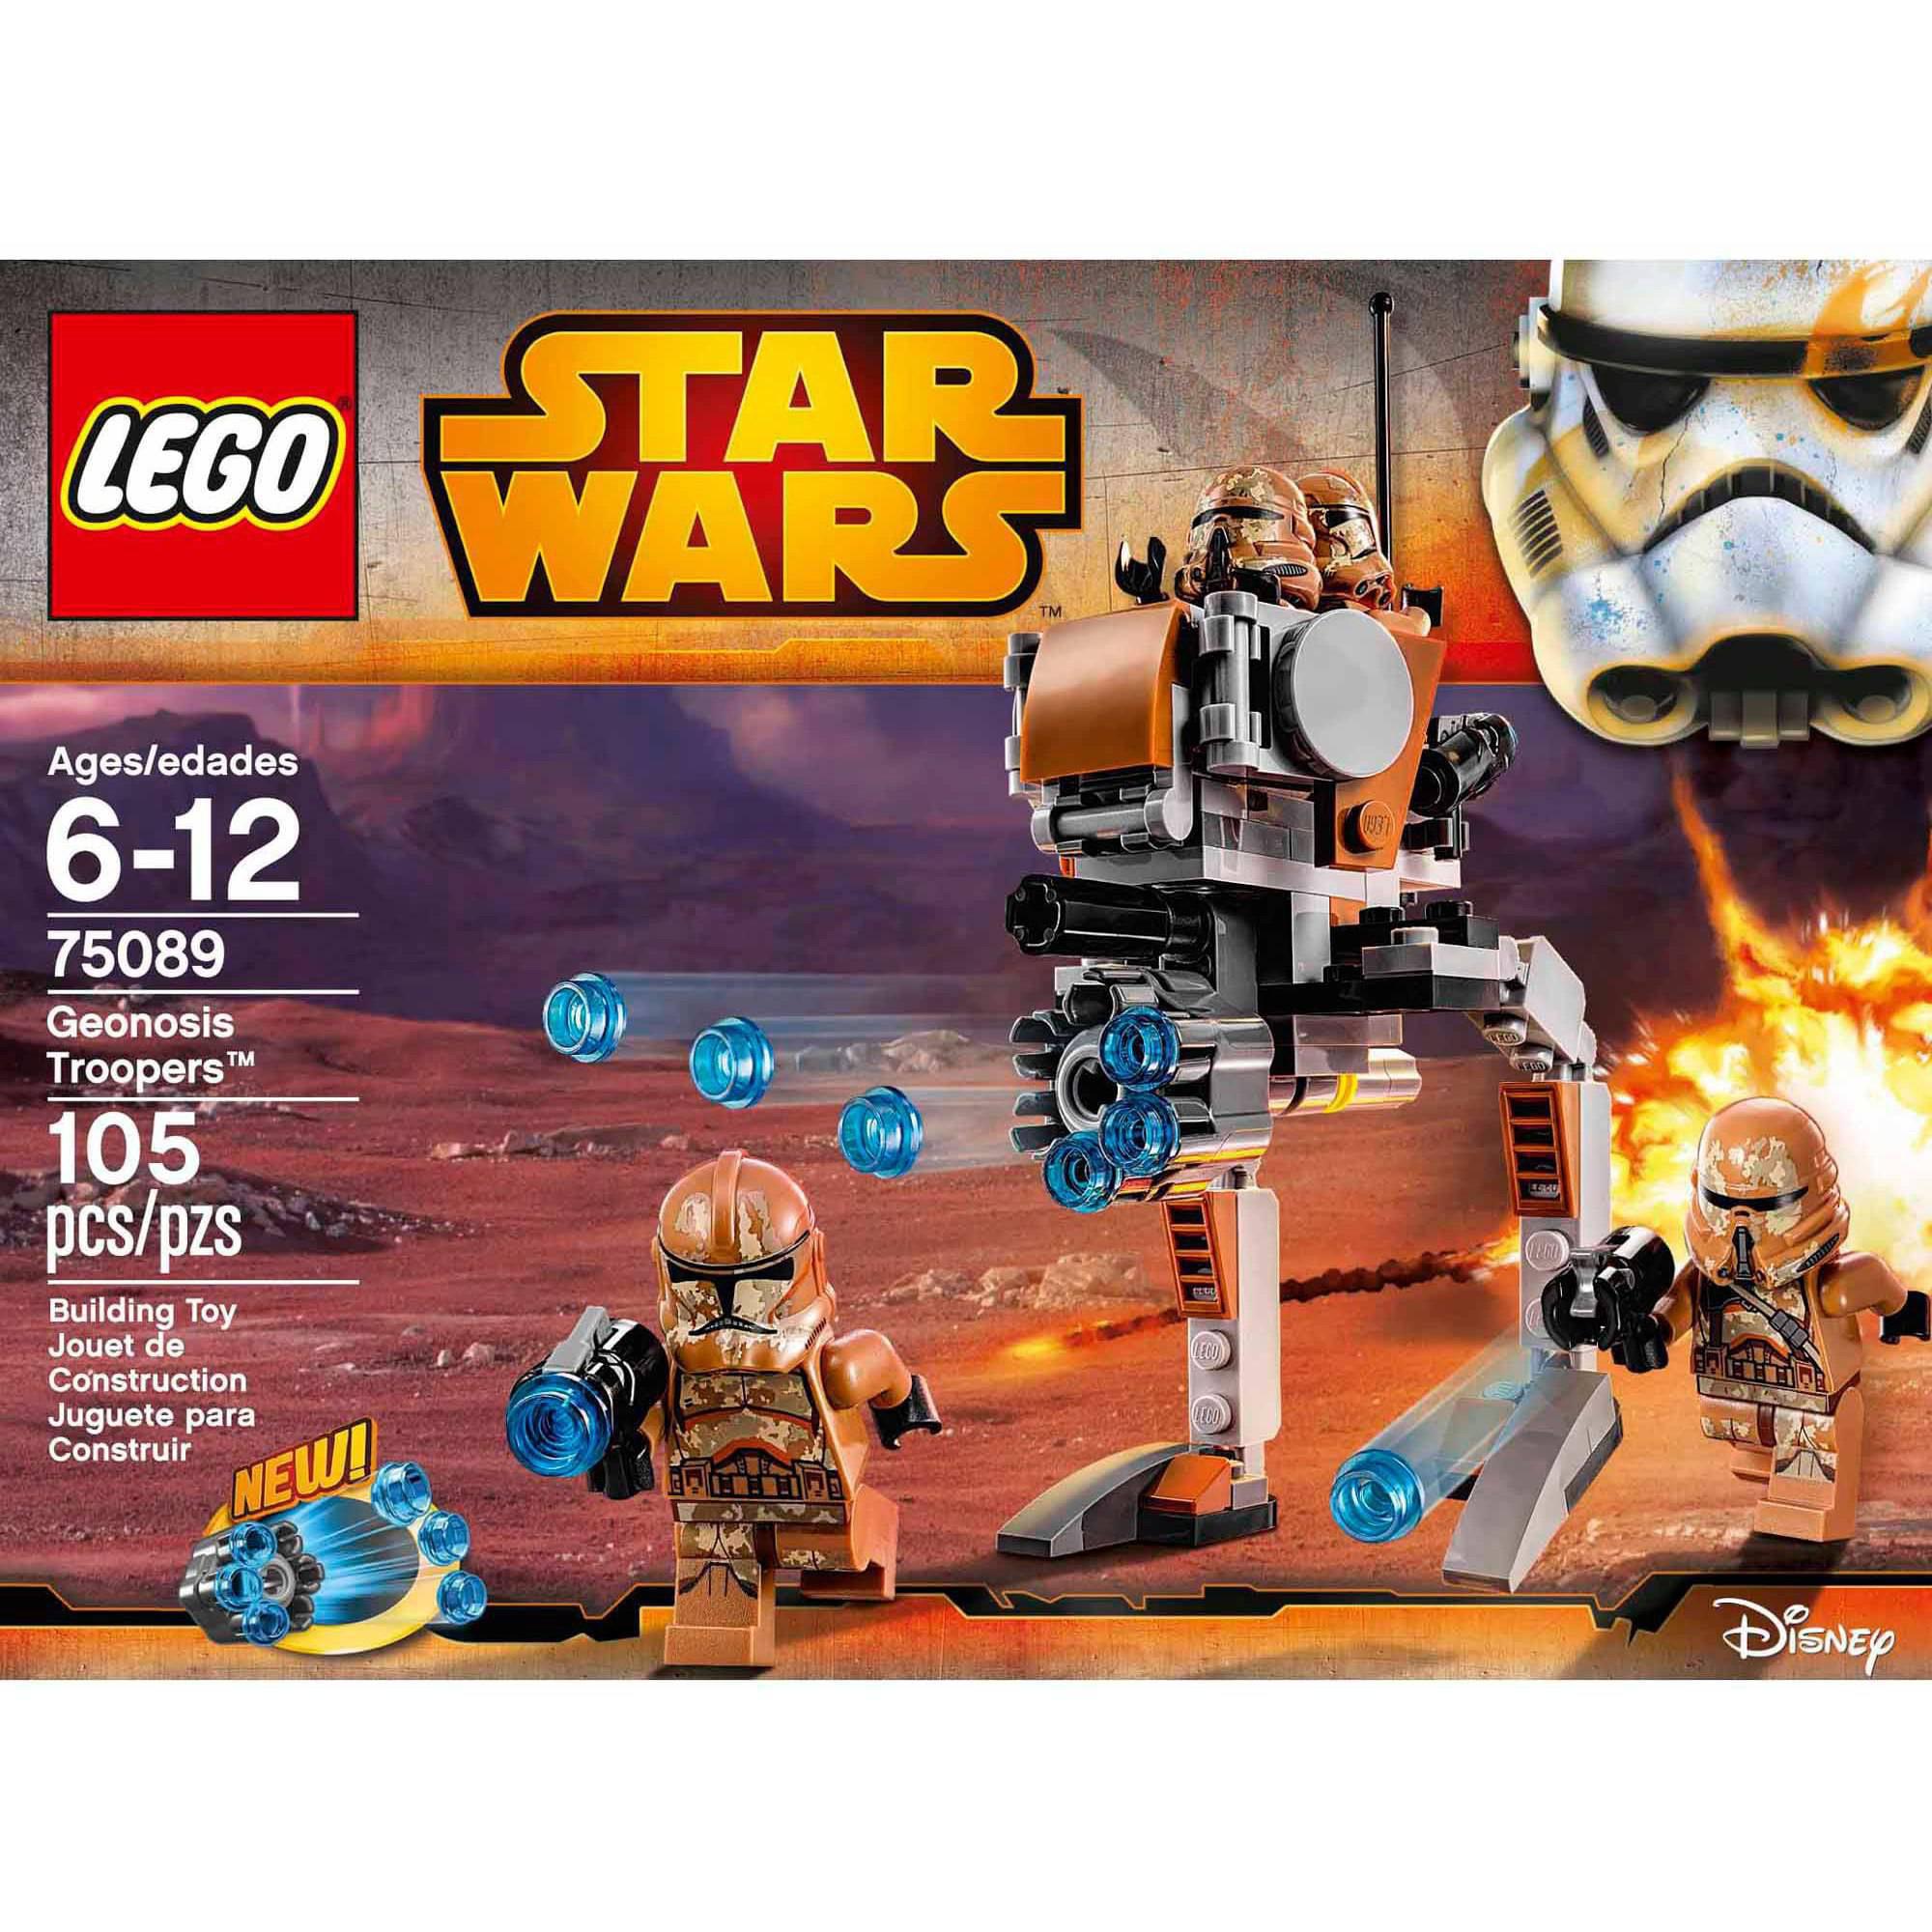 LEGO Star Wars Geonosis Troopers - Walmart.com